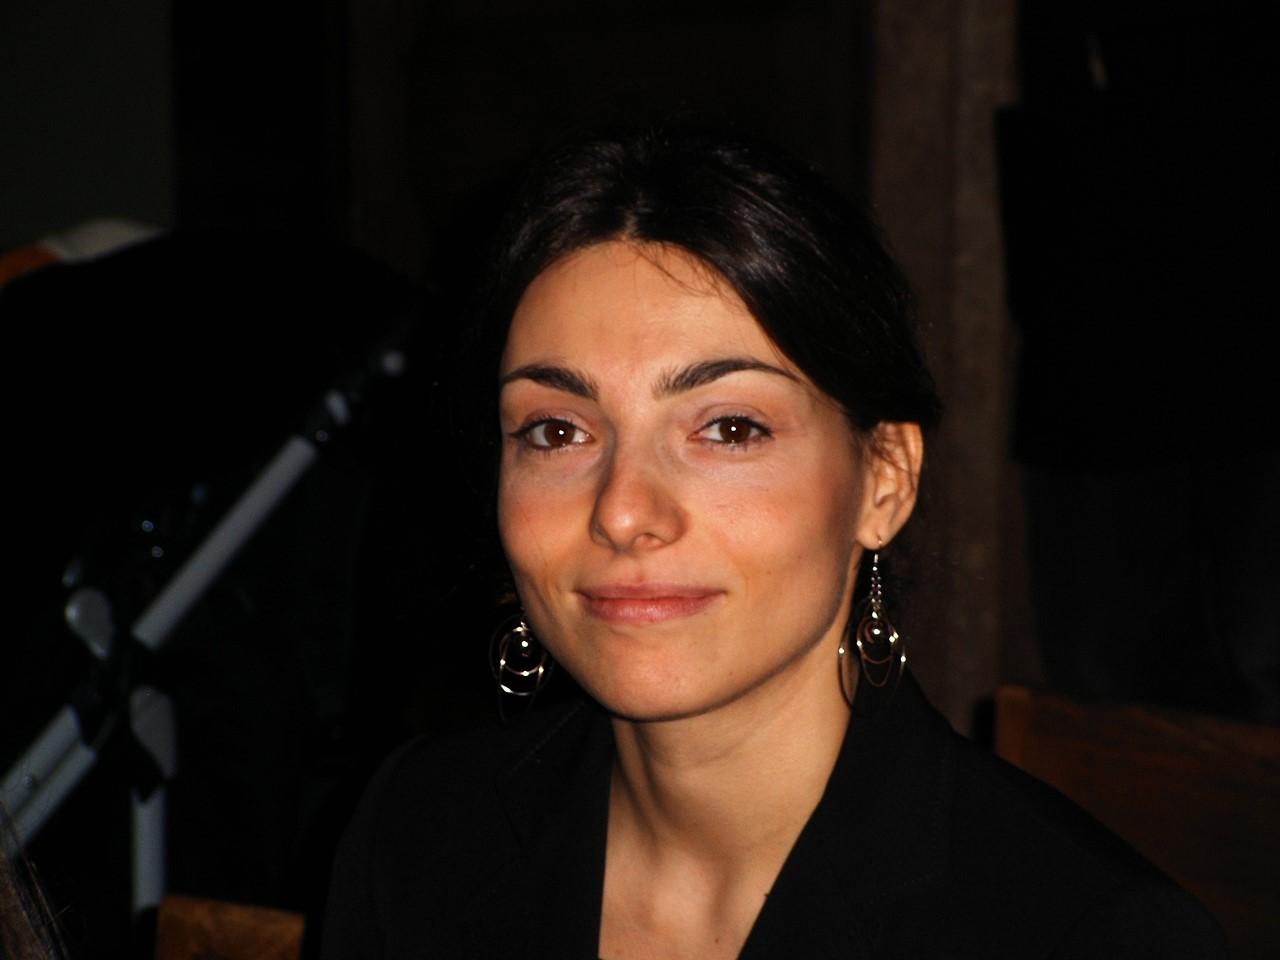 Alessia Gasbarroni